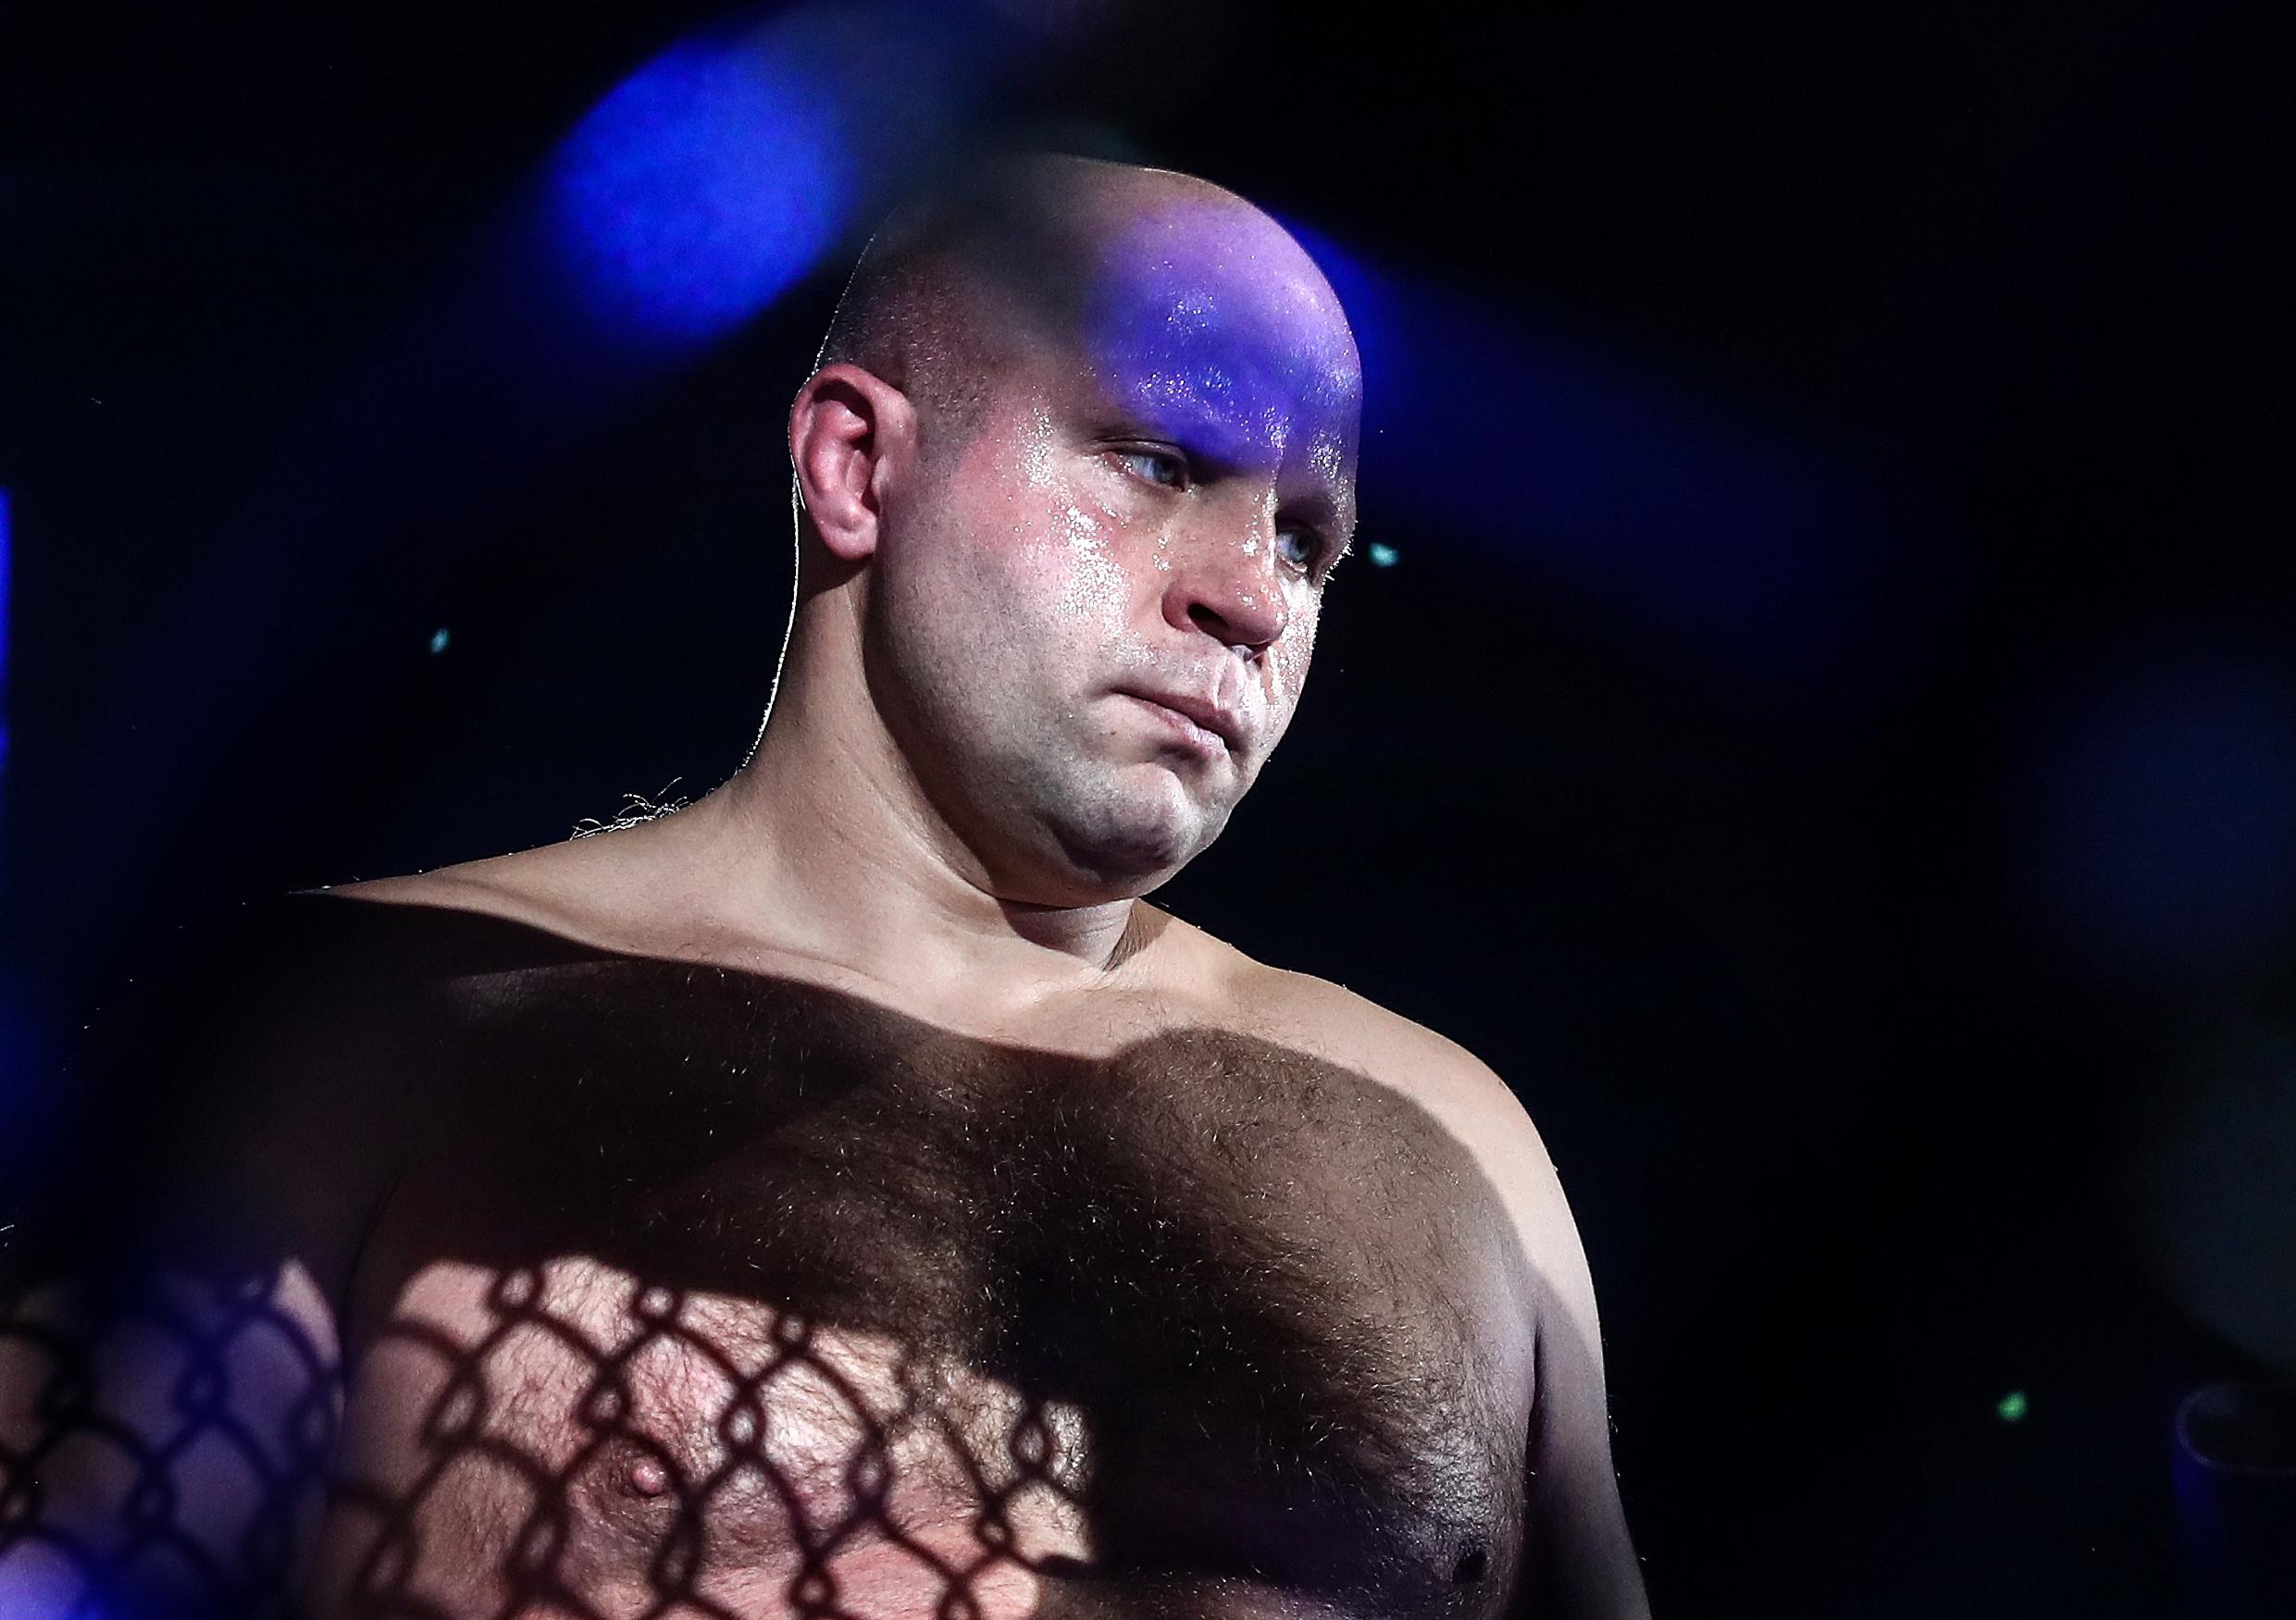 Bellator 237 in Japan: Fedor Emelianenko vs Rampage Jackson